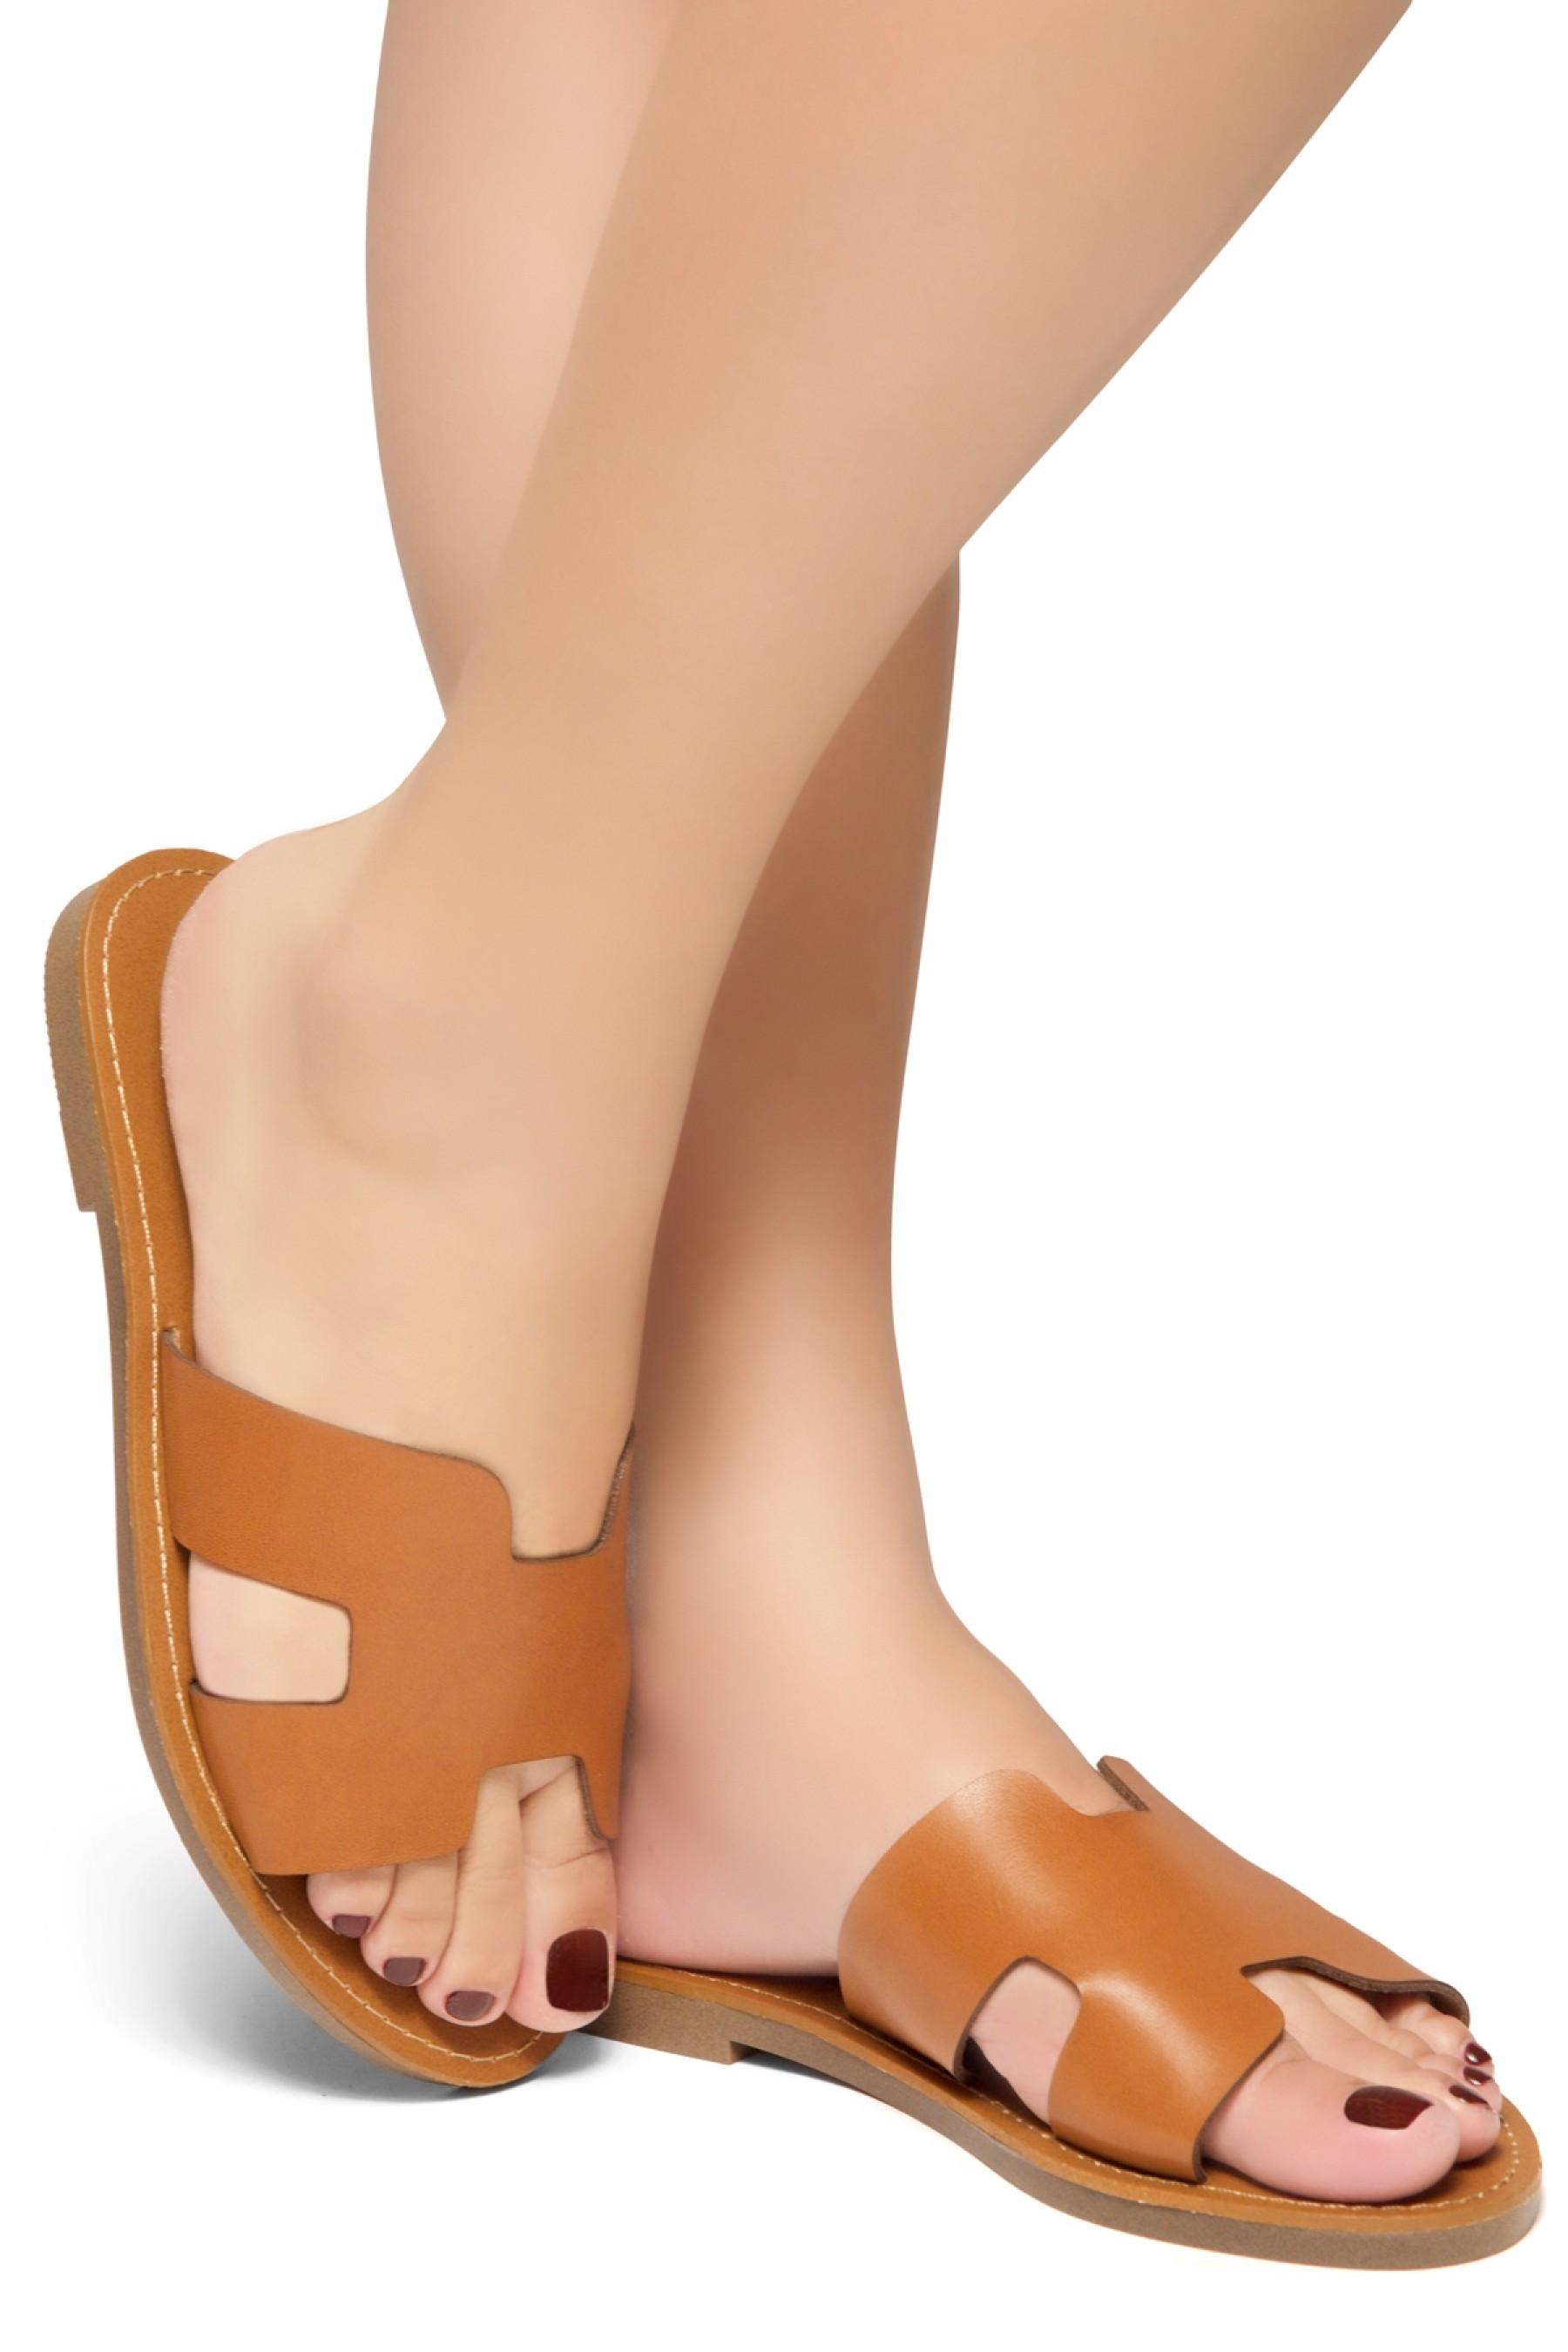 HerStyle Greece- Lightweight Flat Easy Slide-On Sandals (Cognac)